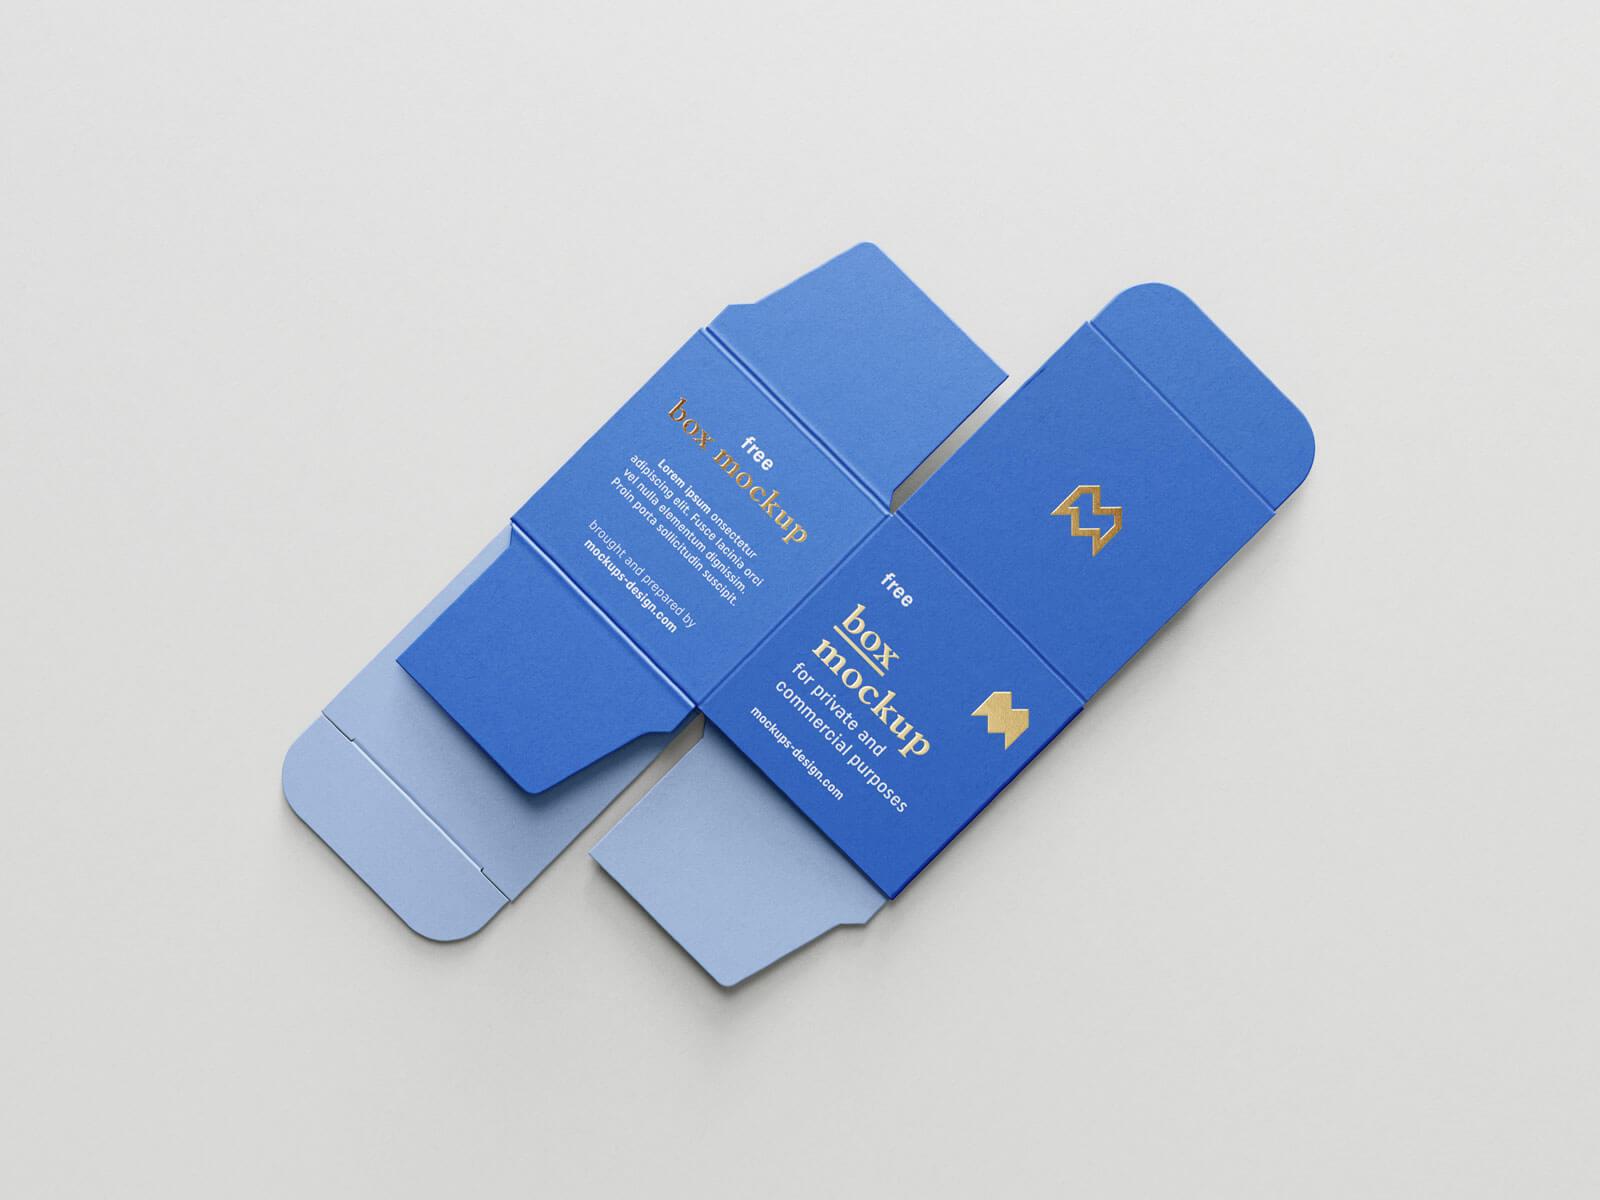 Free Unfolded Box Medicine Packaging Mockup PSD Set (1)